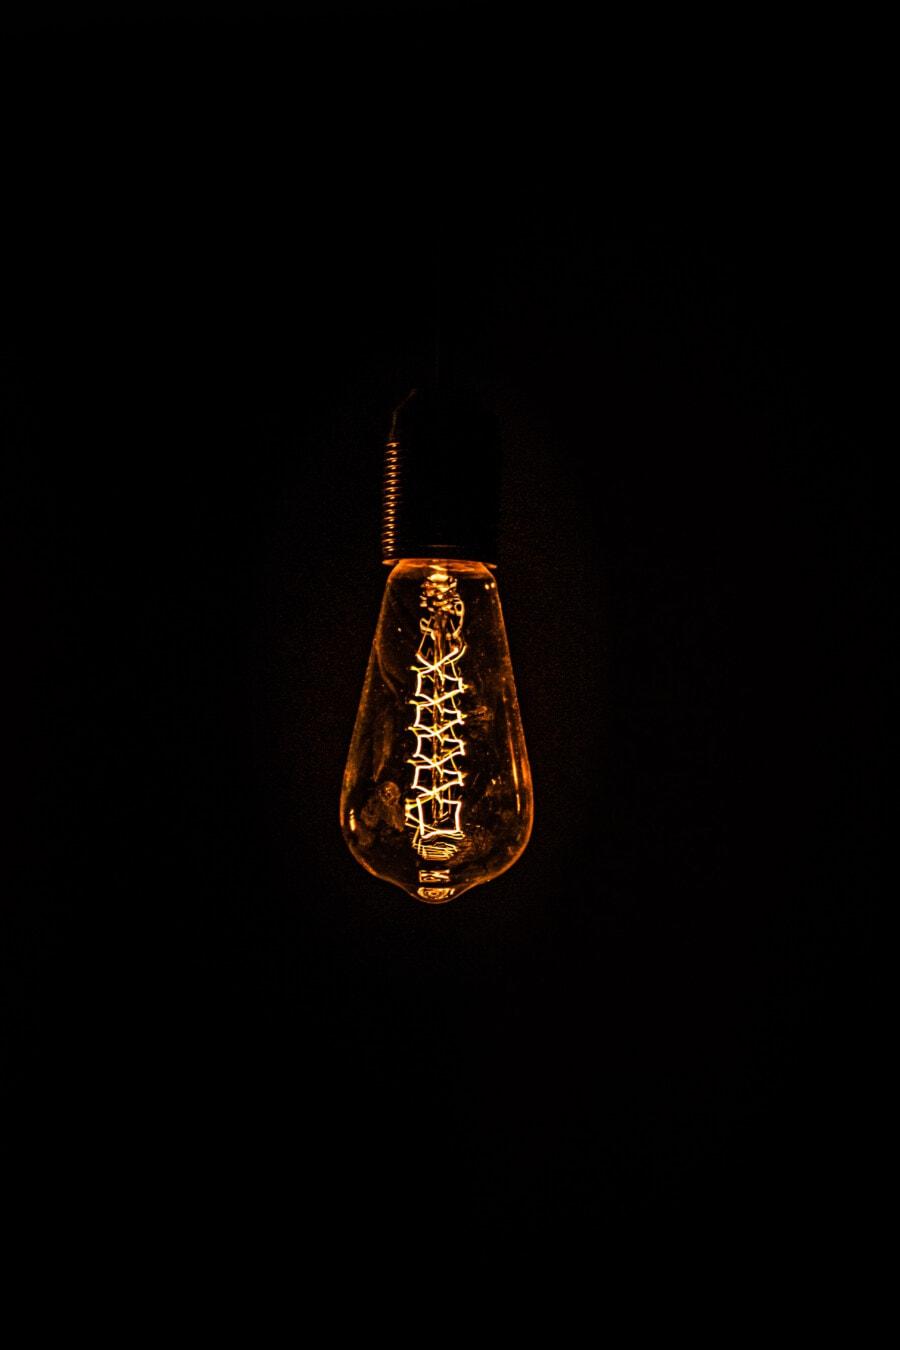 light bulb, vintage, energy, darkness, lumen, wires, filament, dark, art, reflection